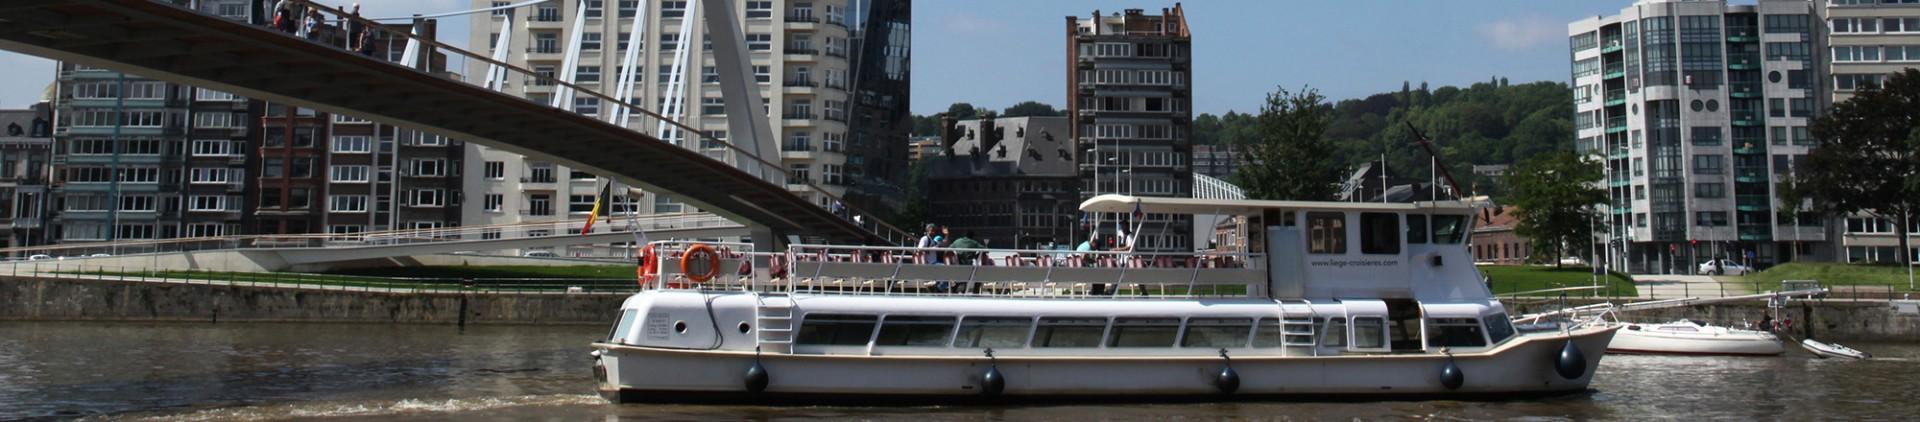 Balades fluviales en province de Liège